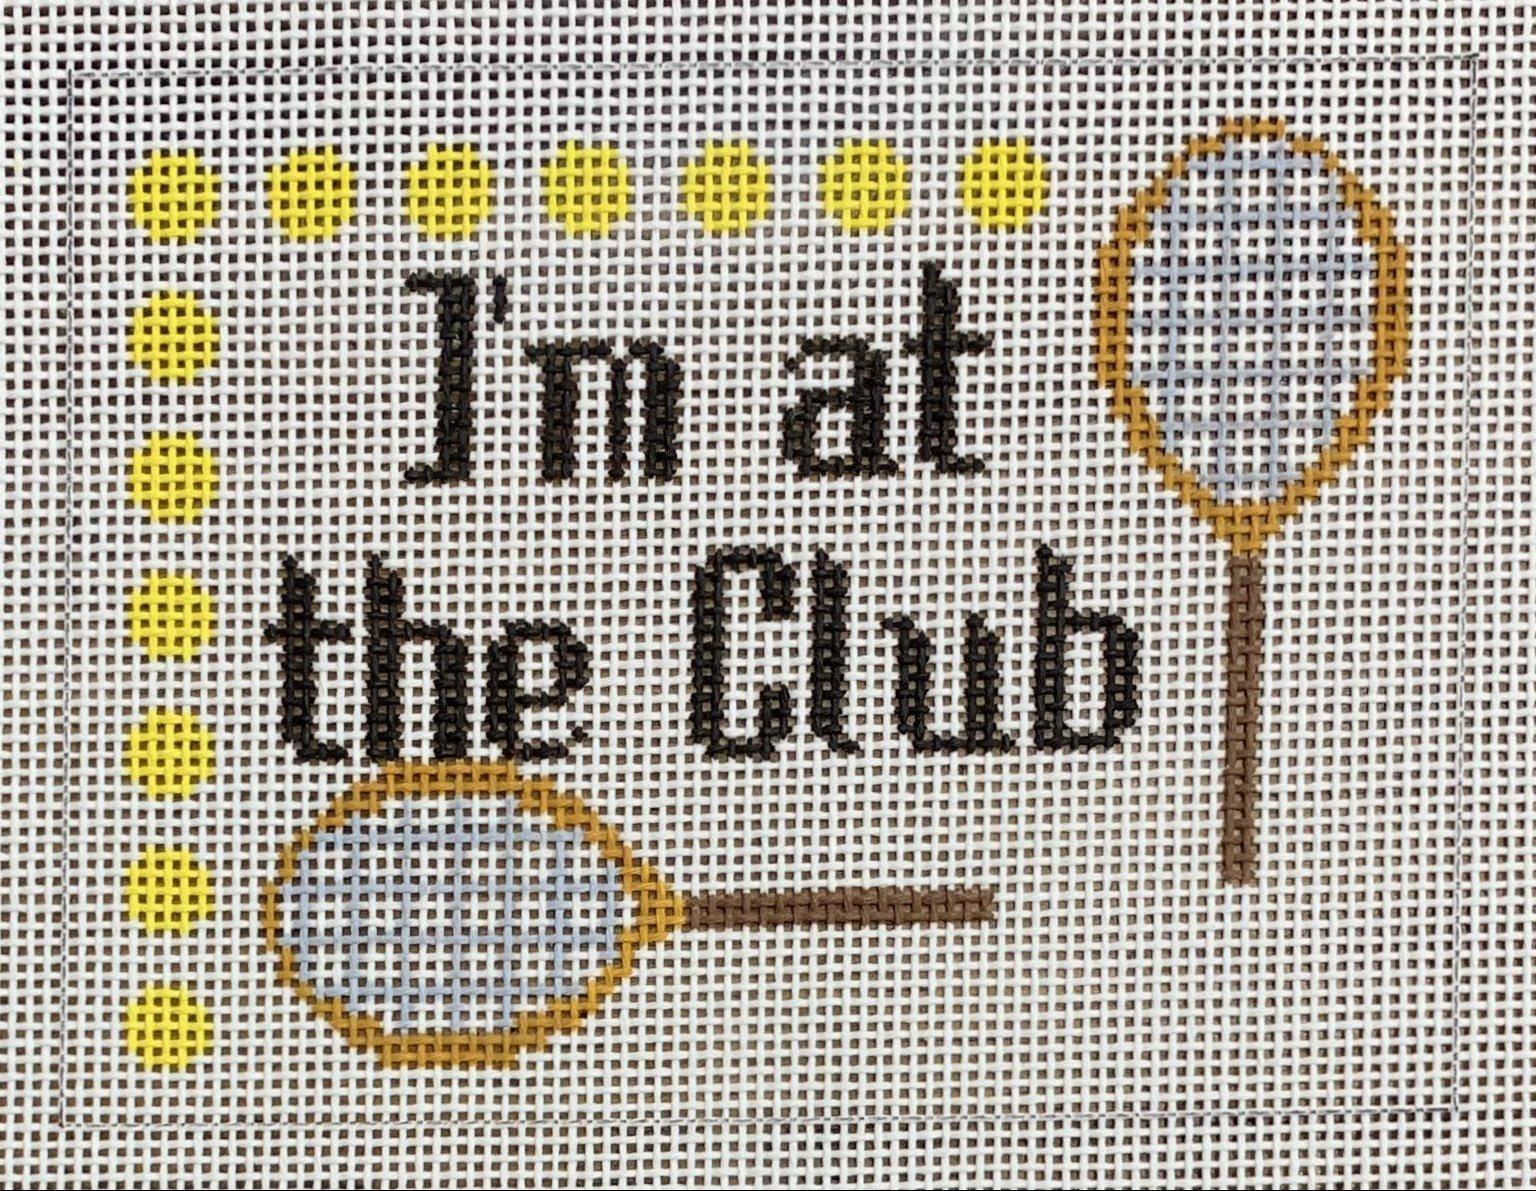 I'm at the Club - Tennis